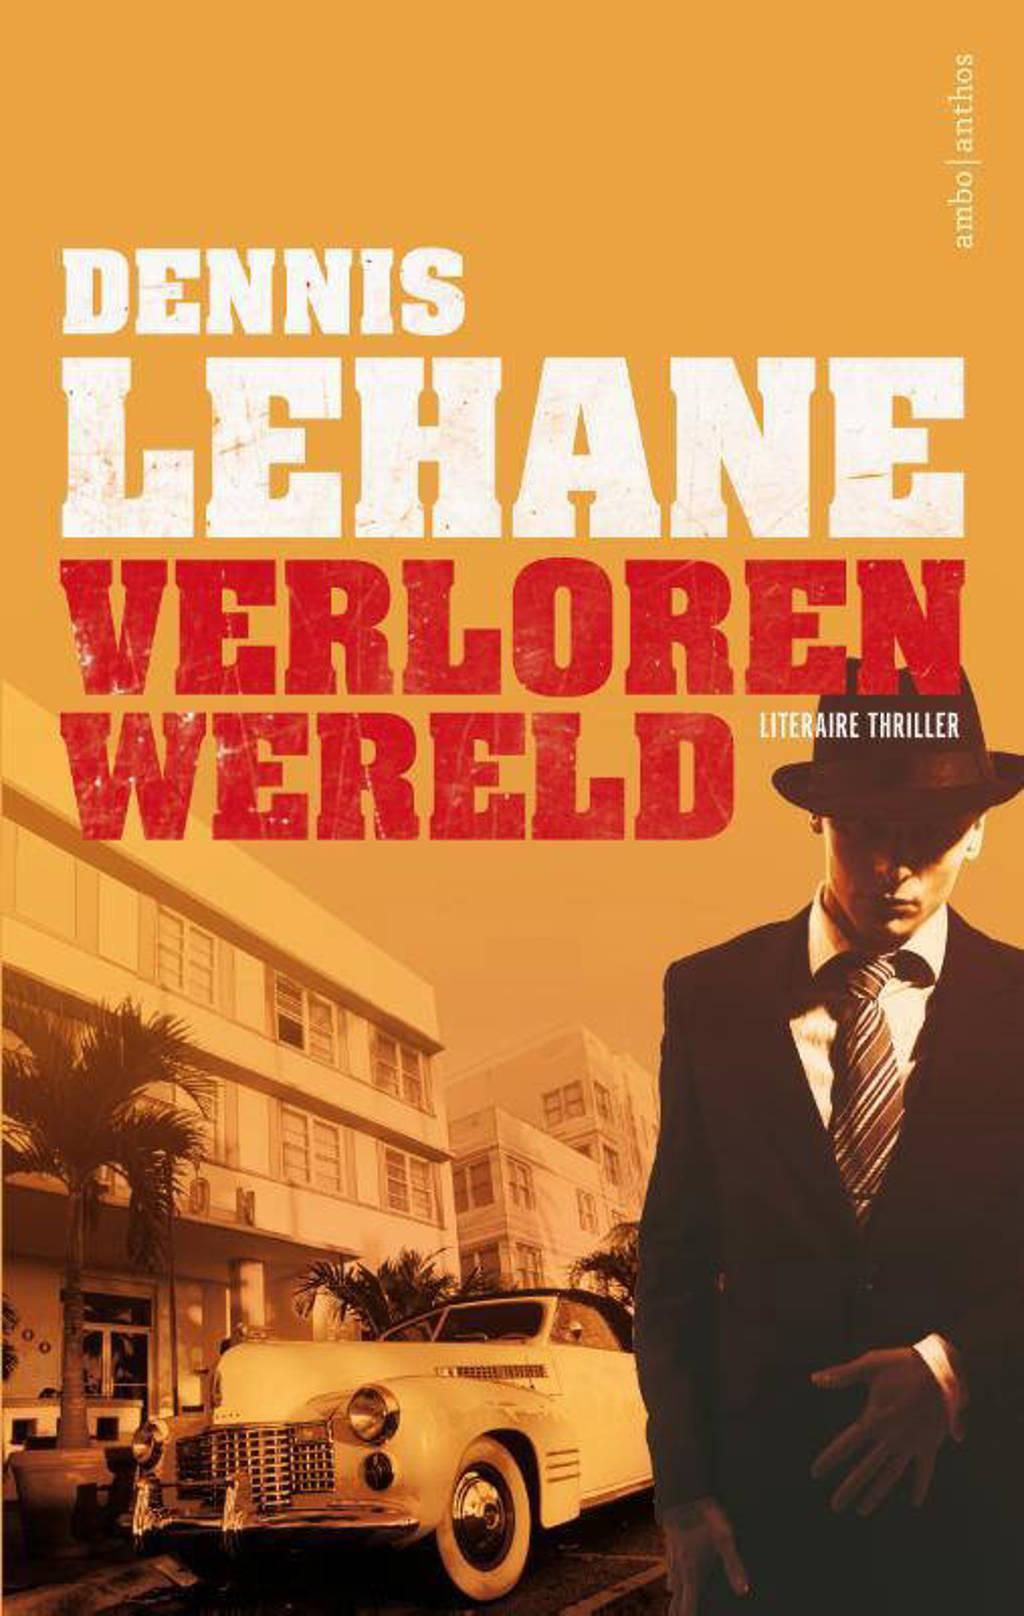 Verloren wereld - Dennis Lehane